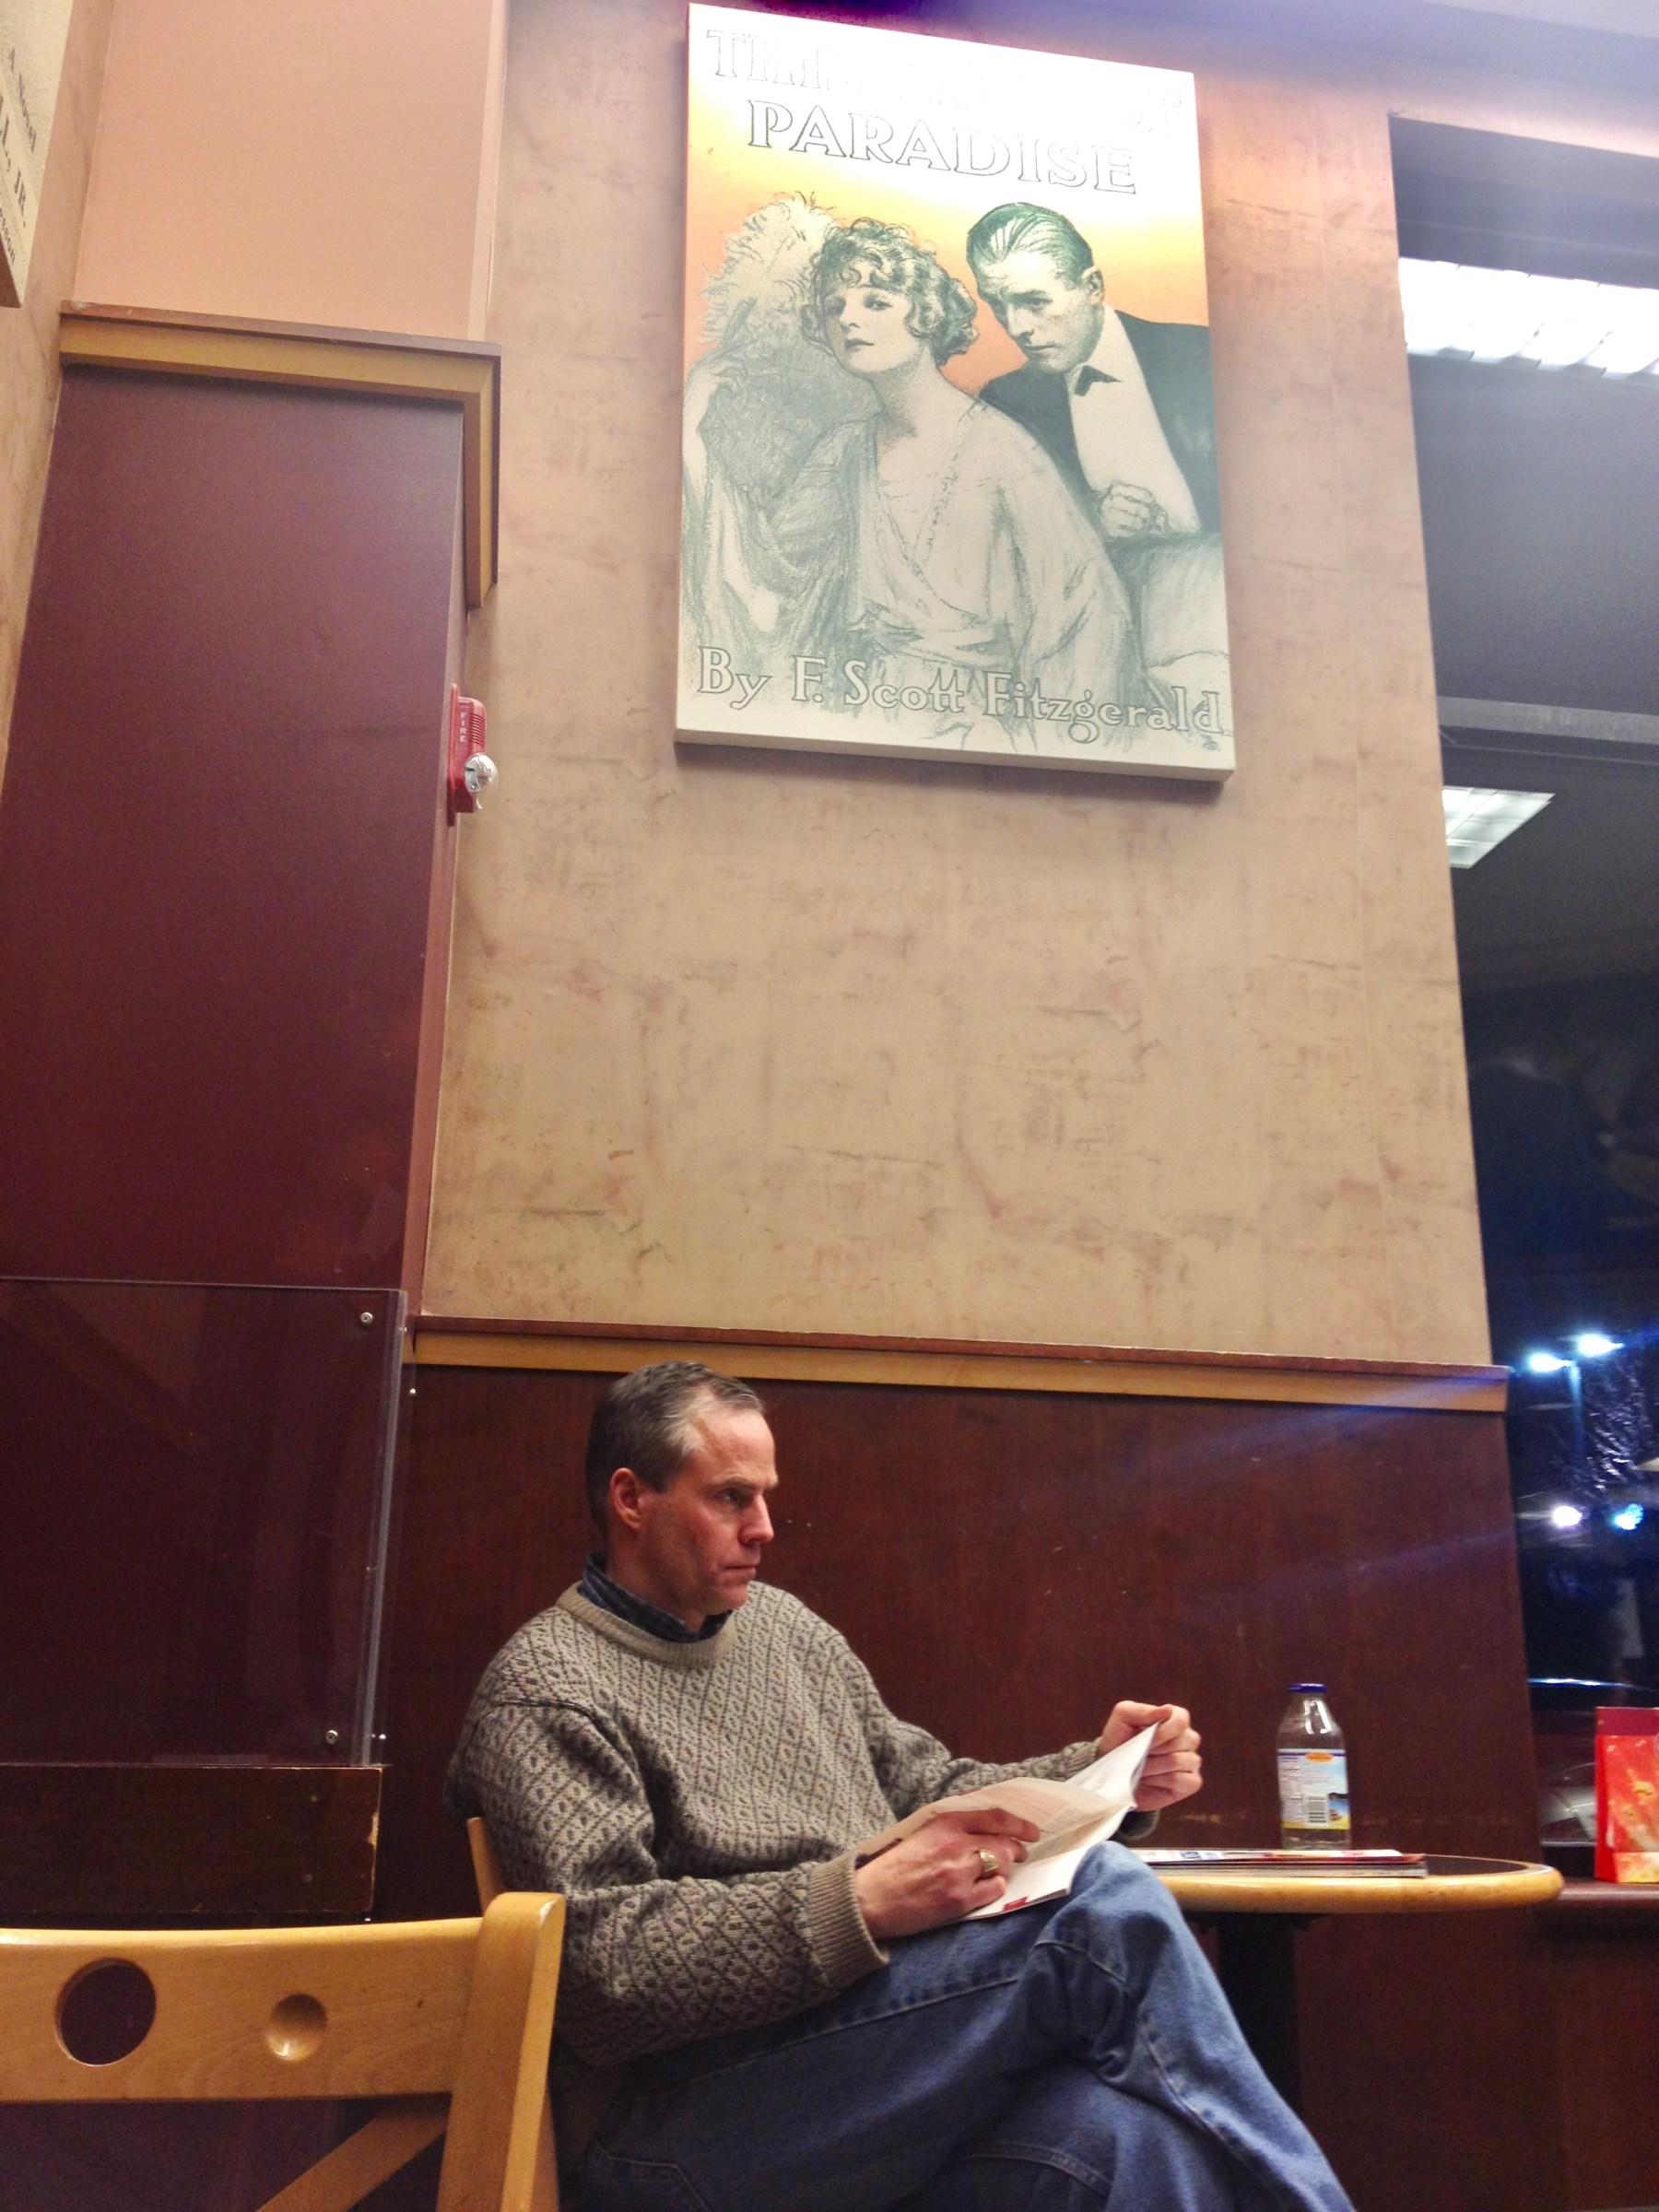 Barnes & Noble cafe guy, Burlington MA